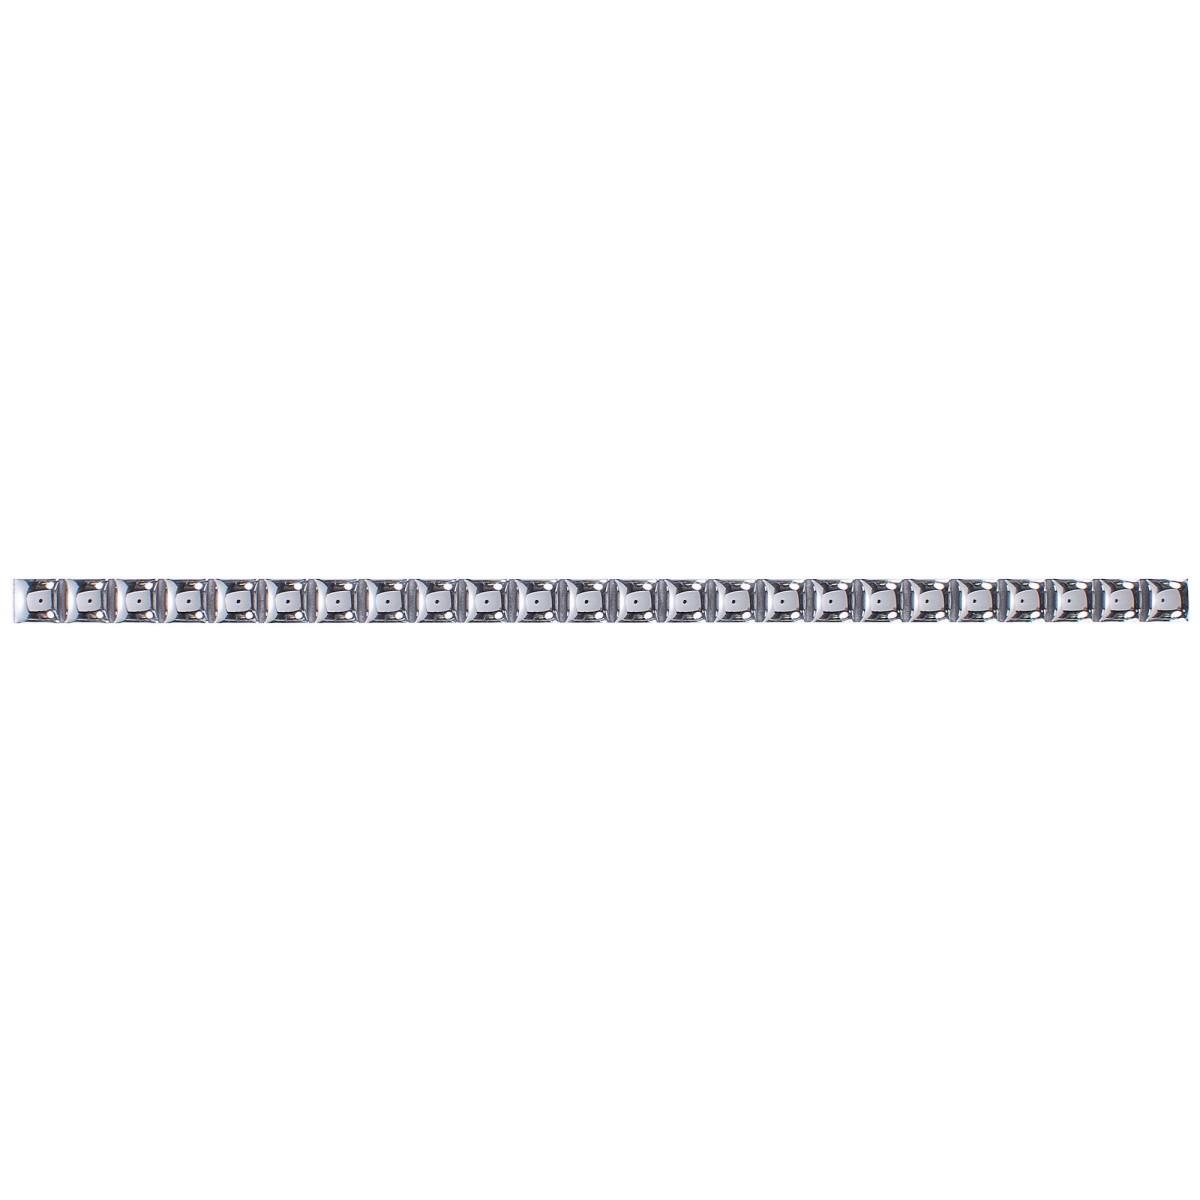 Бордюр «Бусинки» 10х250 мм цвет платиновый